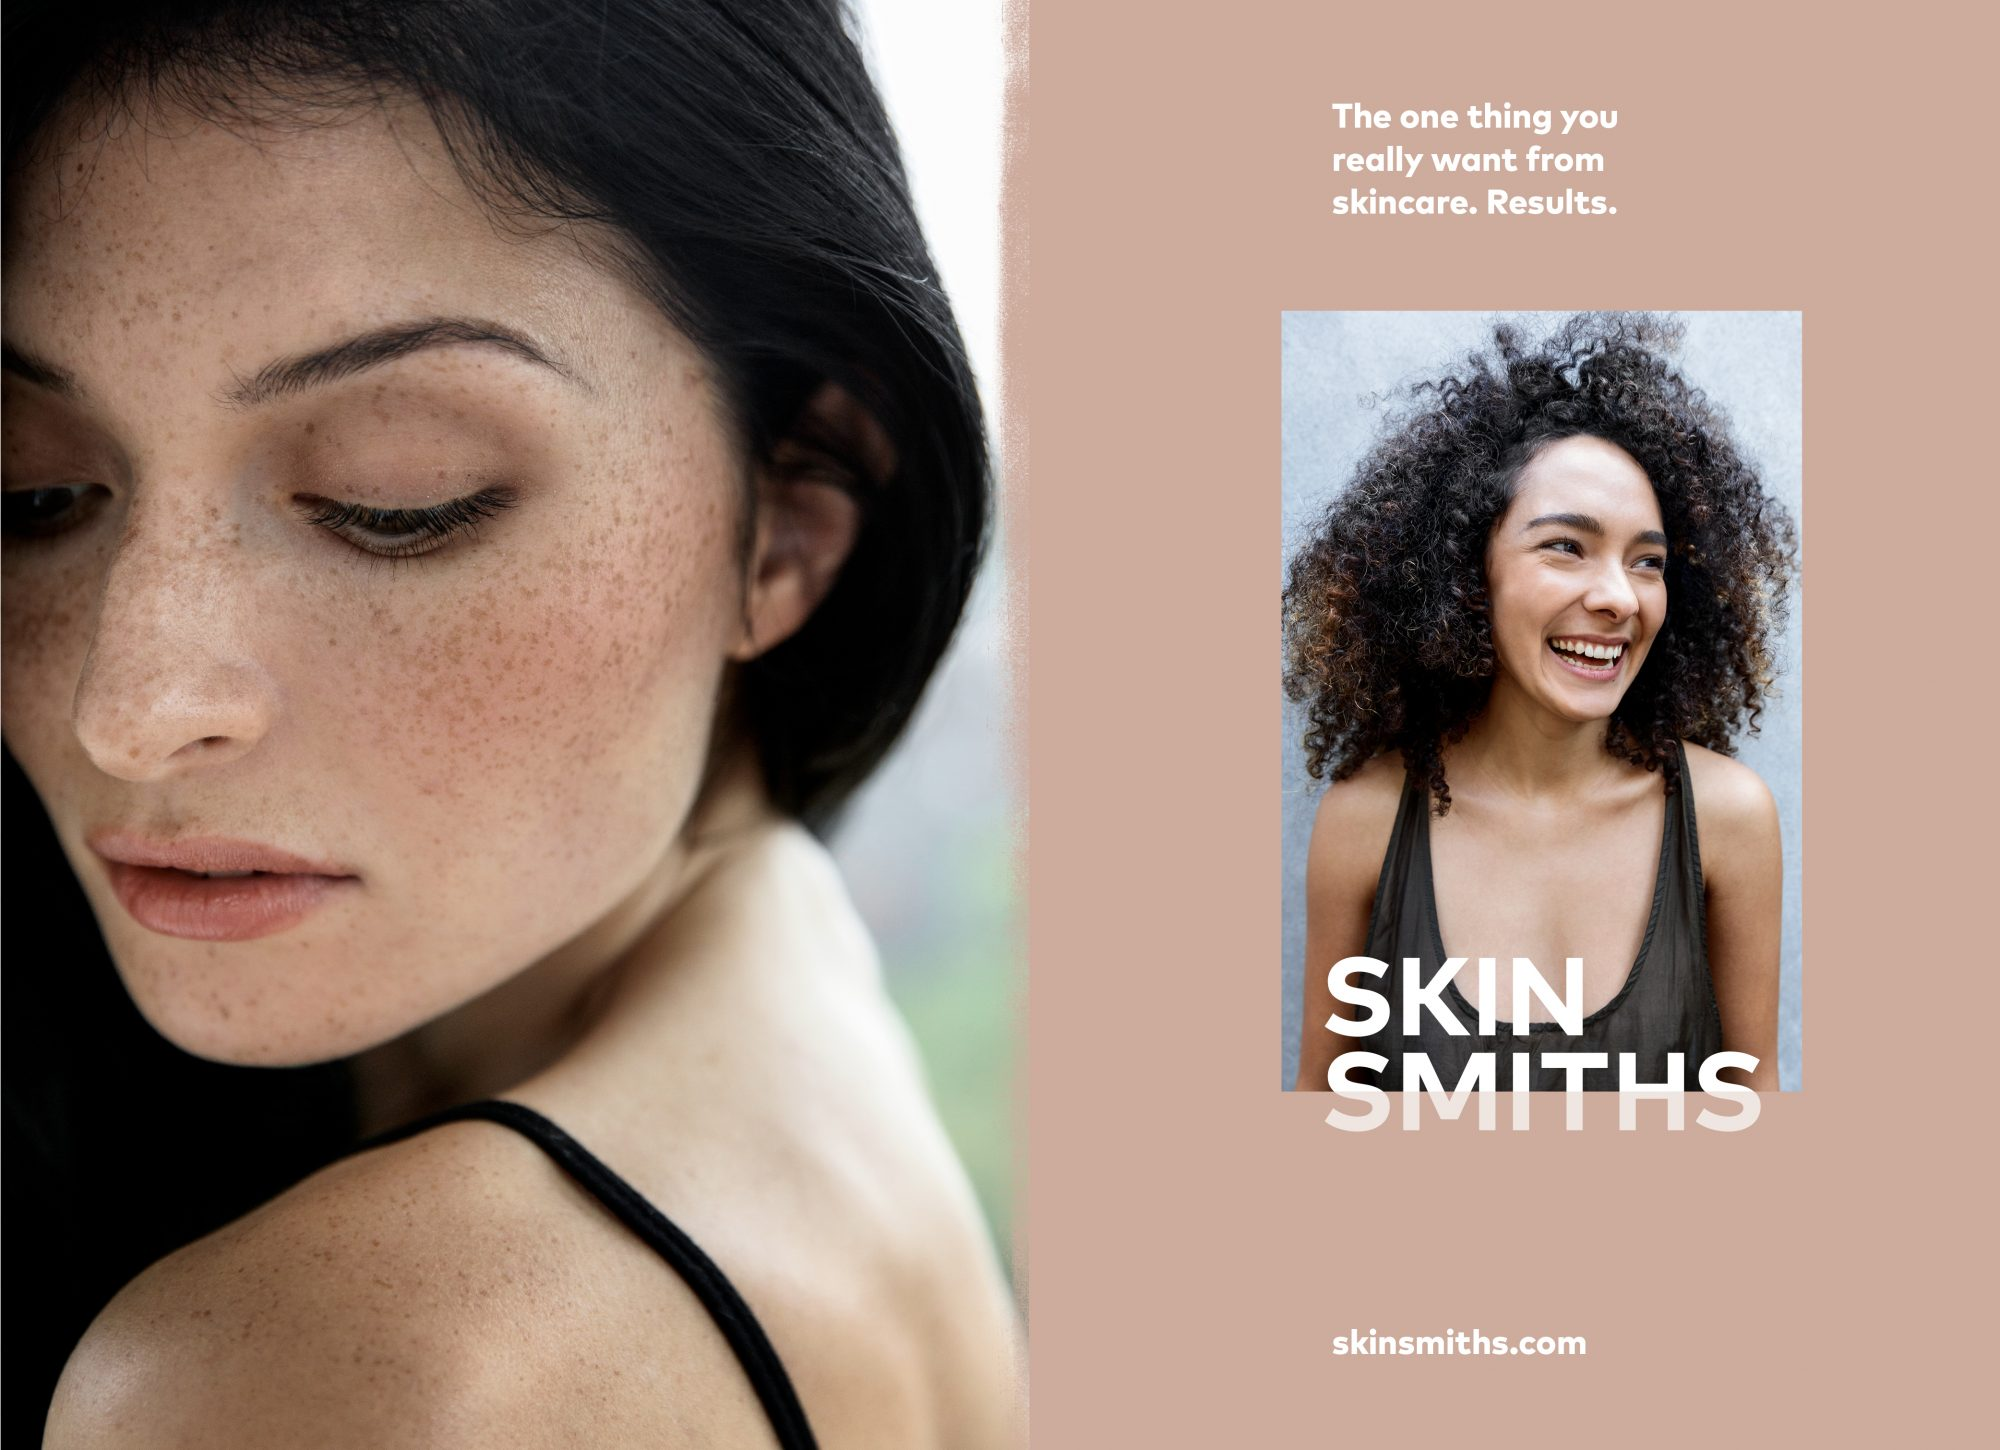 https://tanamitchell.com/wp-content/uploads/2018/07/SkinSmiths2018-2000x1450px8-2000x1450.jpg